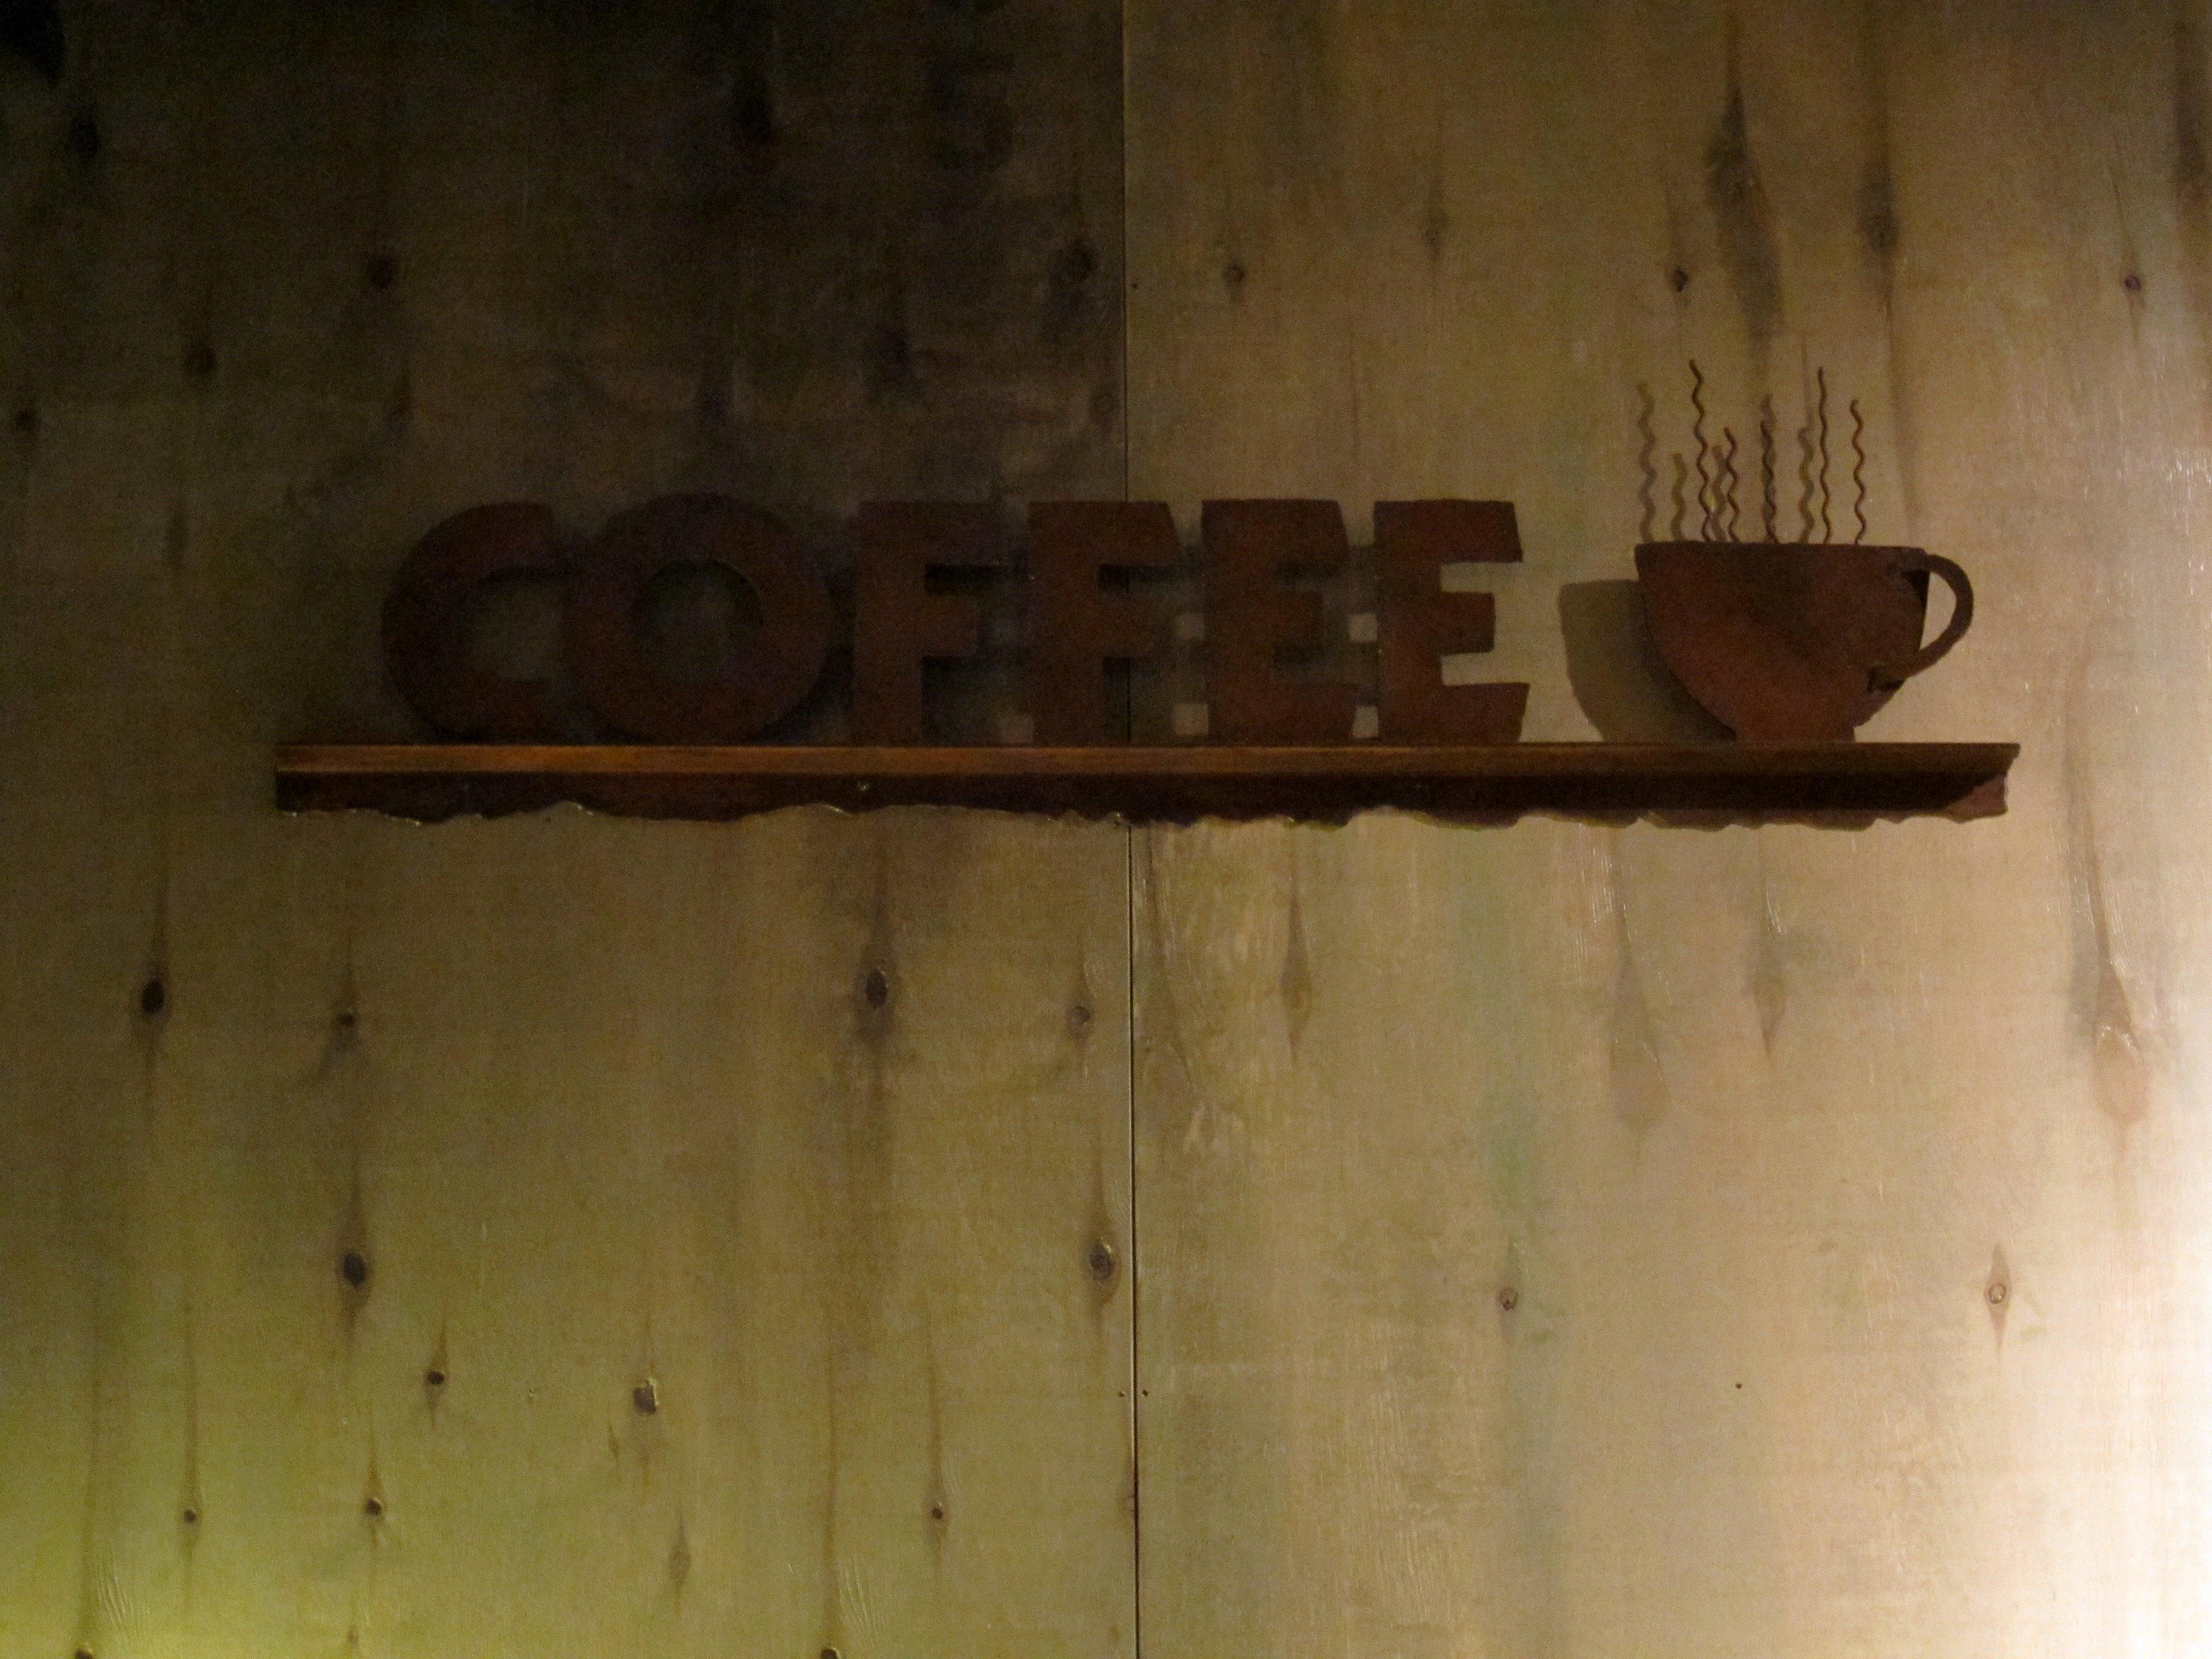 Coffee Sign, Cafe, Coffee, Dark, Dusk, HQ Photo